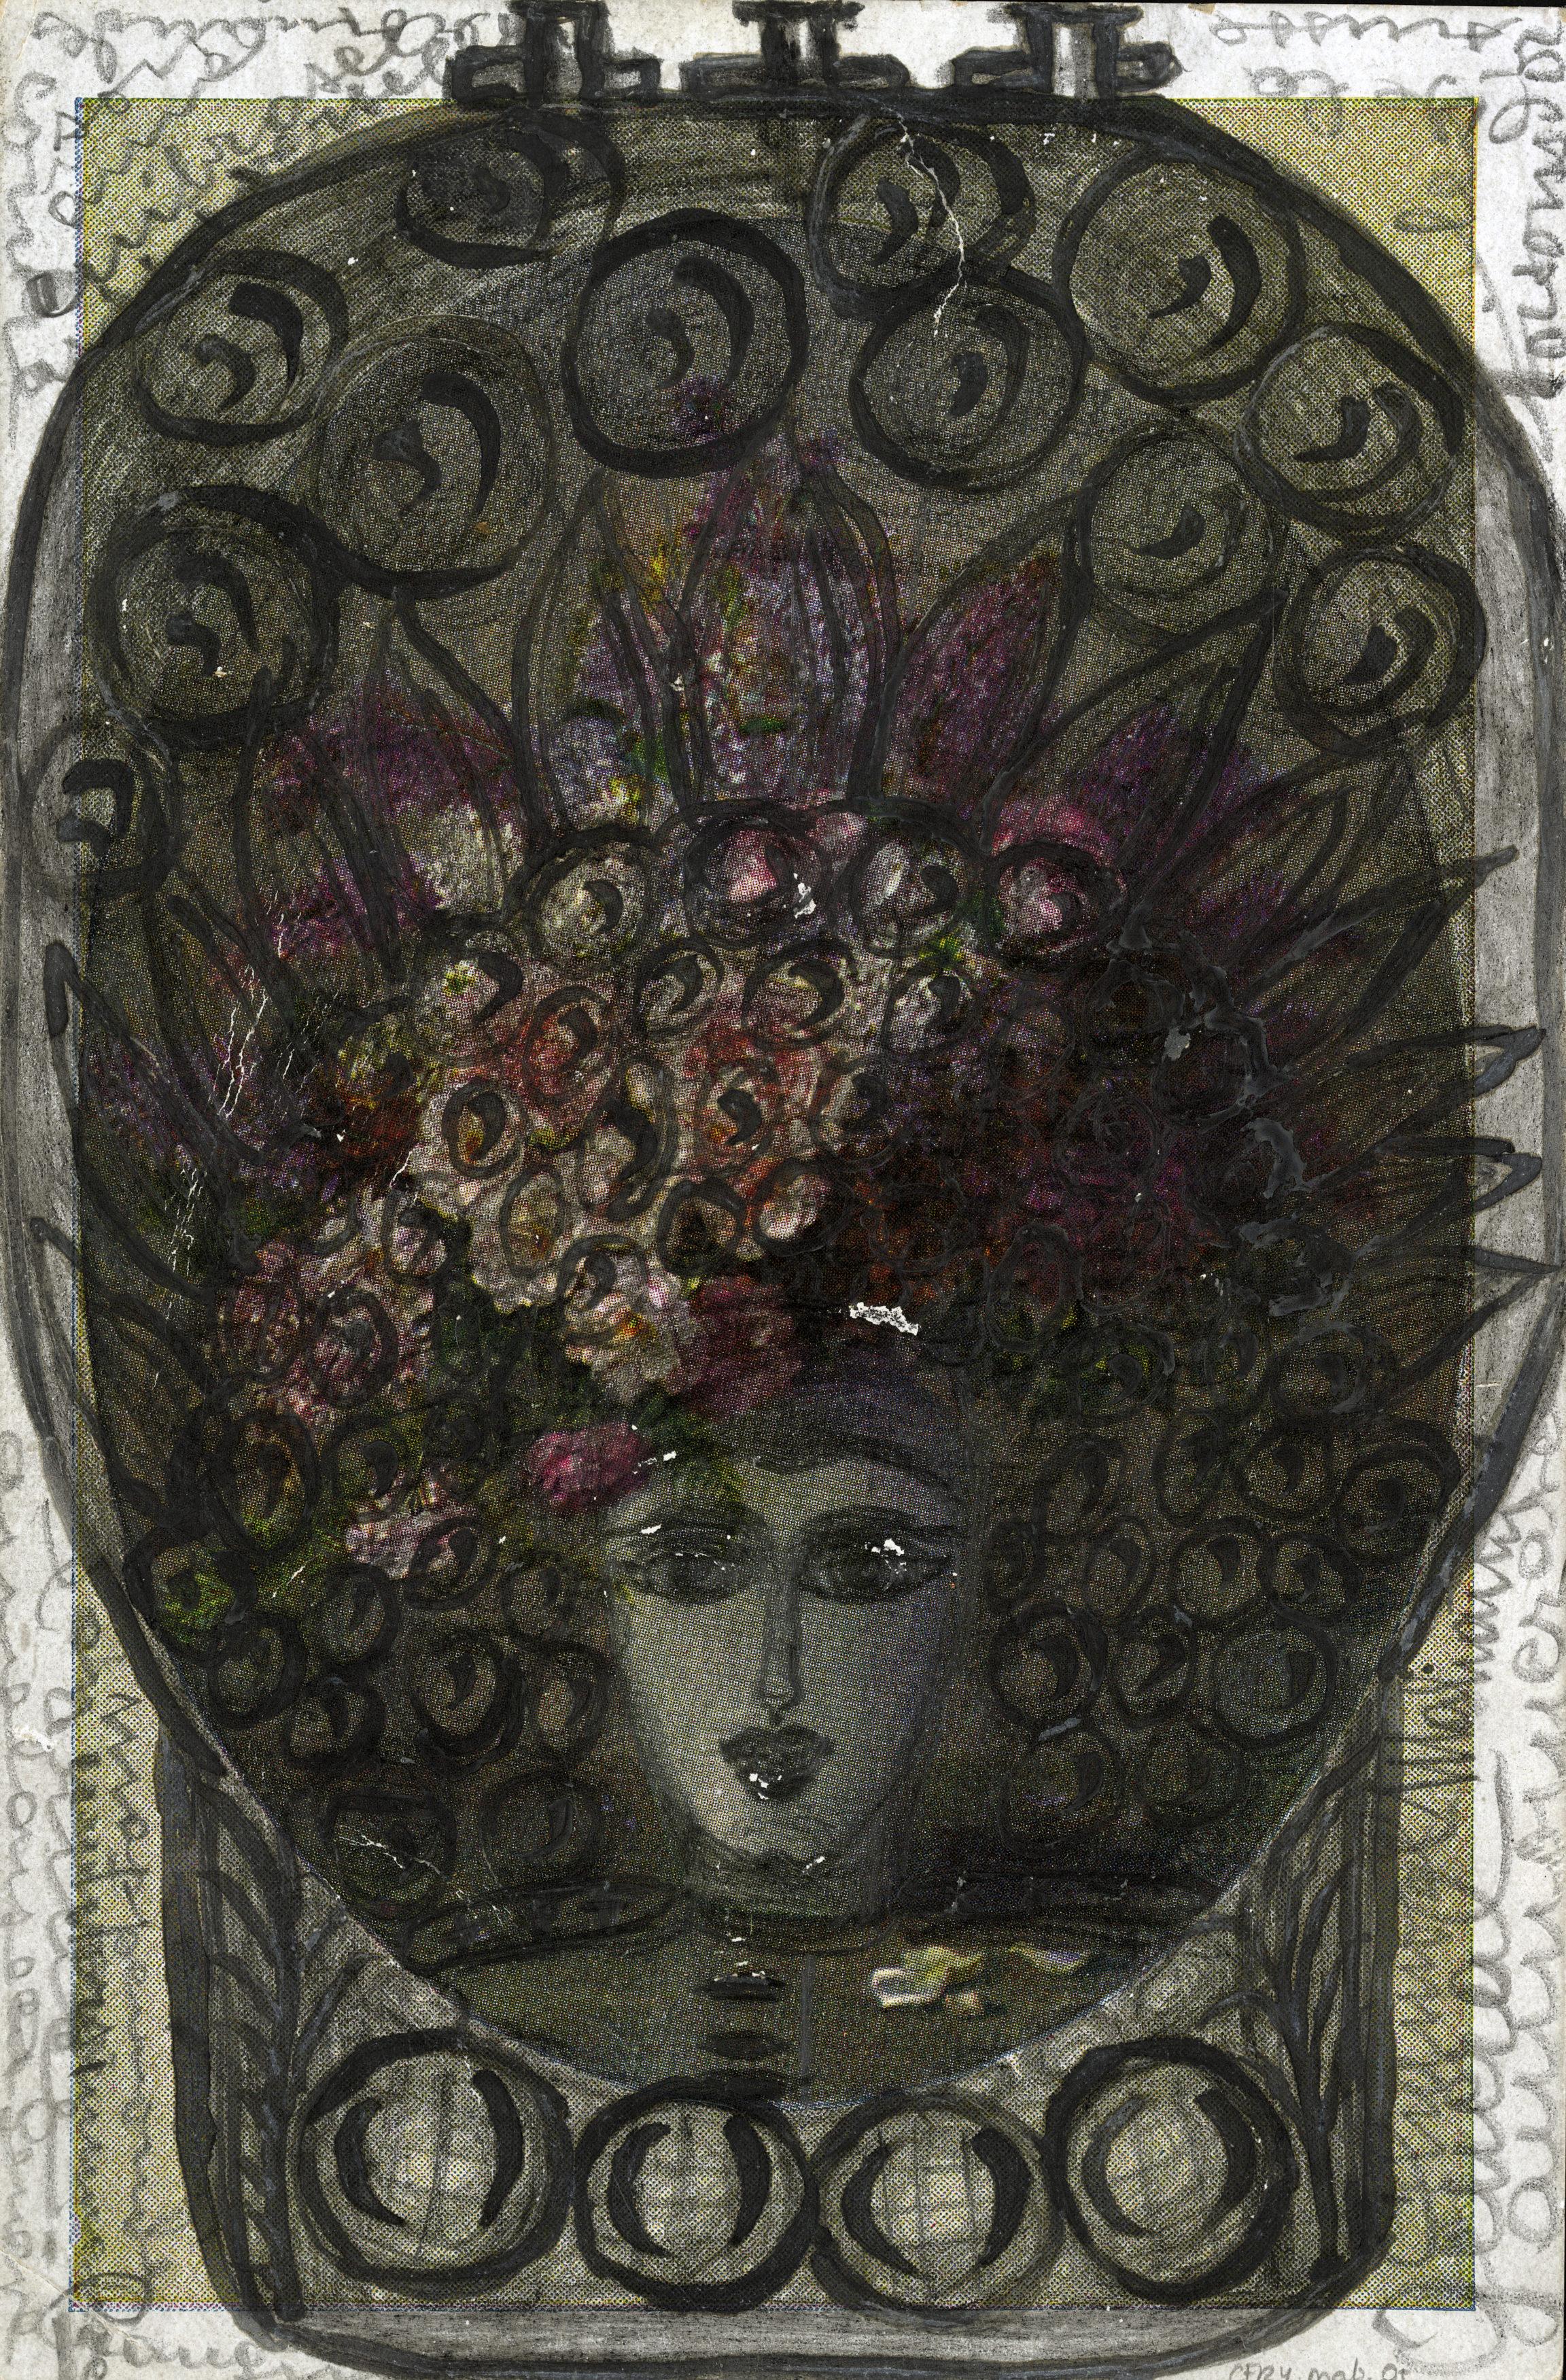 Aloïse (Aloïse Corbaz, dite) , Materdolorosa, 1922